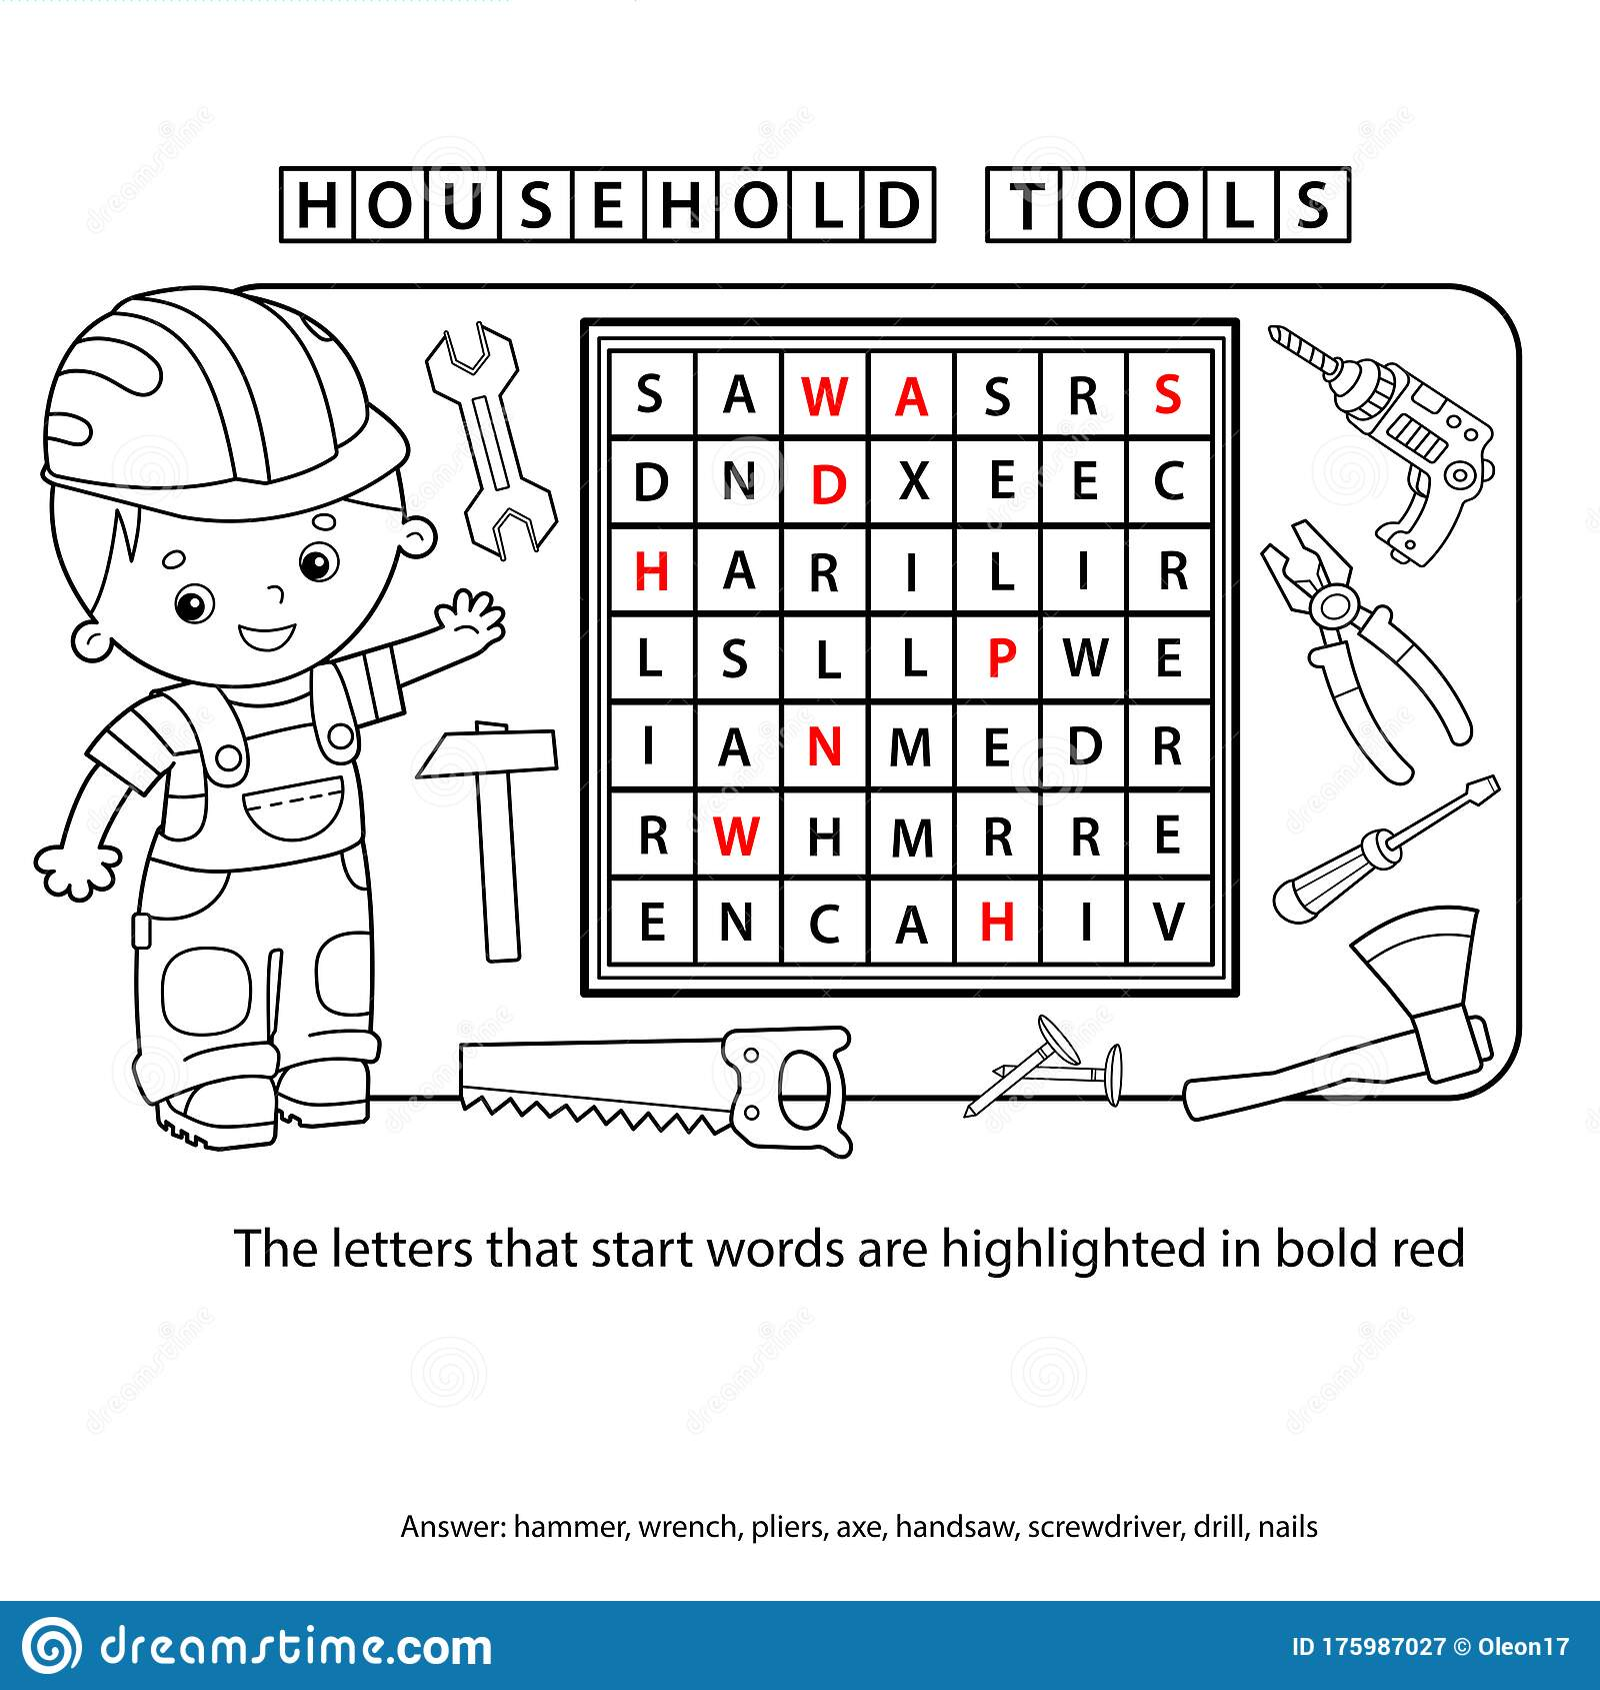 Crossword Puzzle For Preschool Children Set Of Household